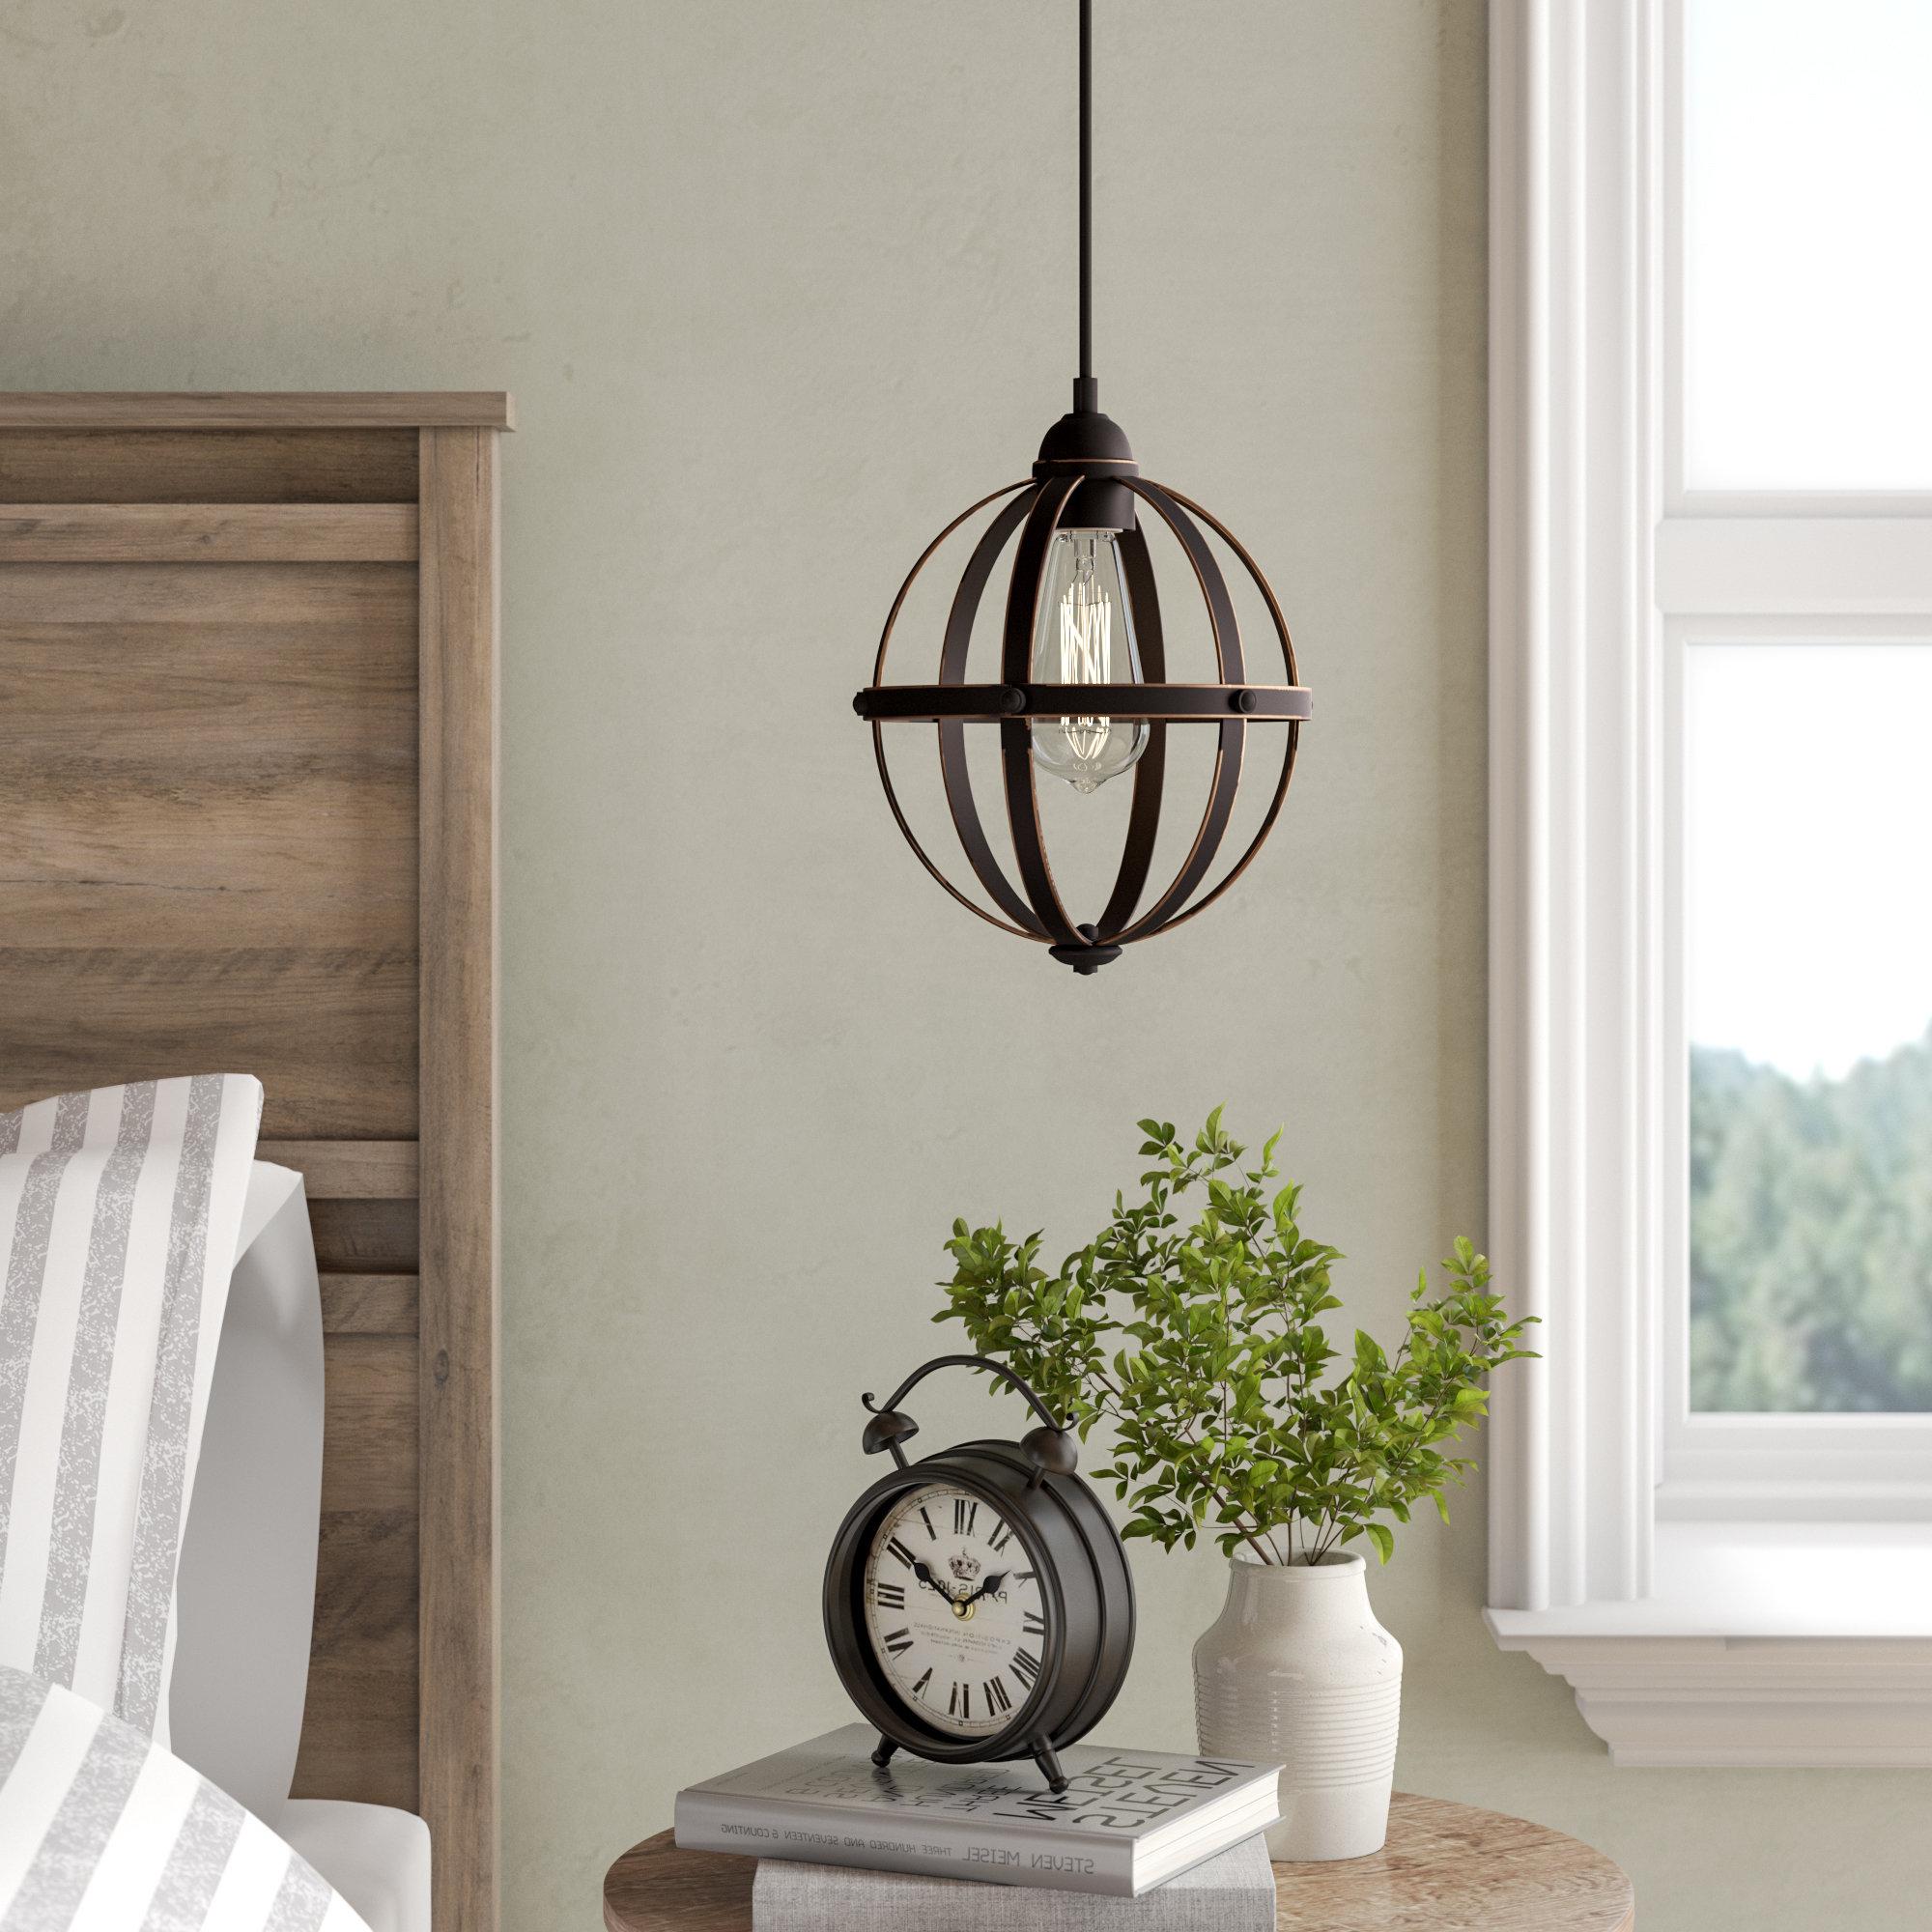 Genna 1 Light Single Globe Pendant With Regard To Current Prange 1 Light Single Globe Pendants (Gallery 5 of 20)